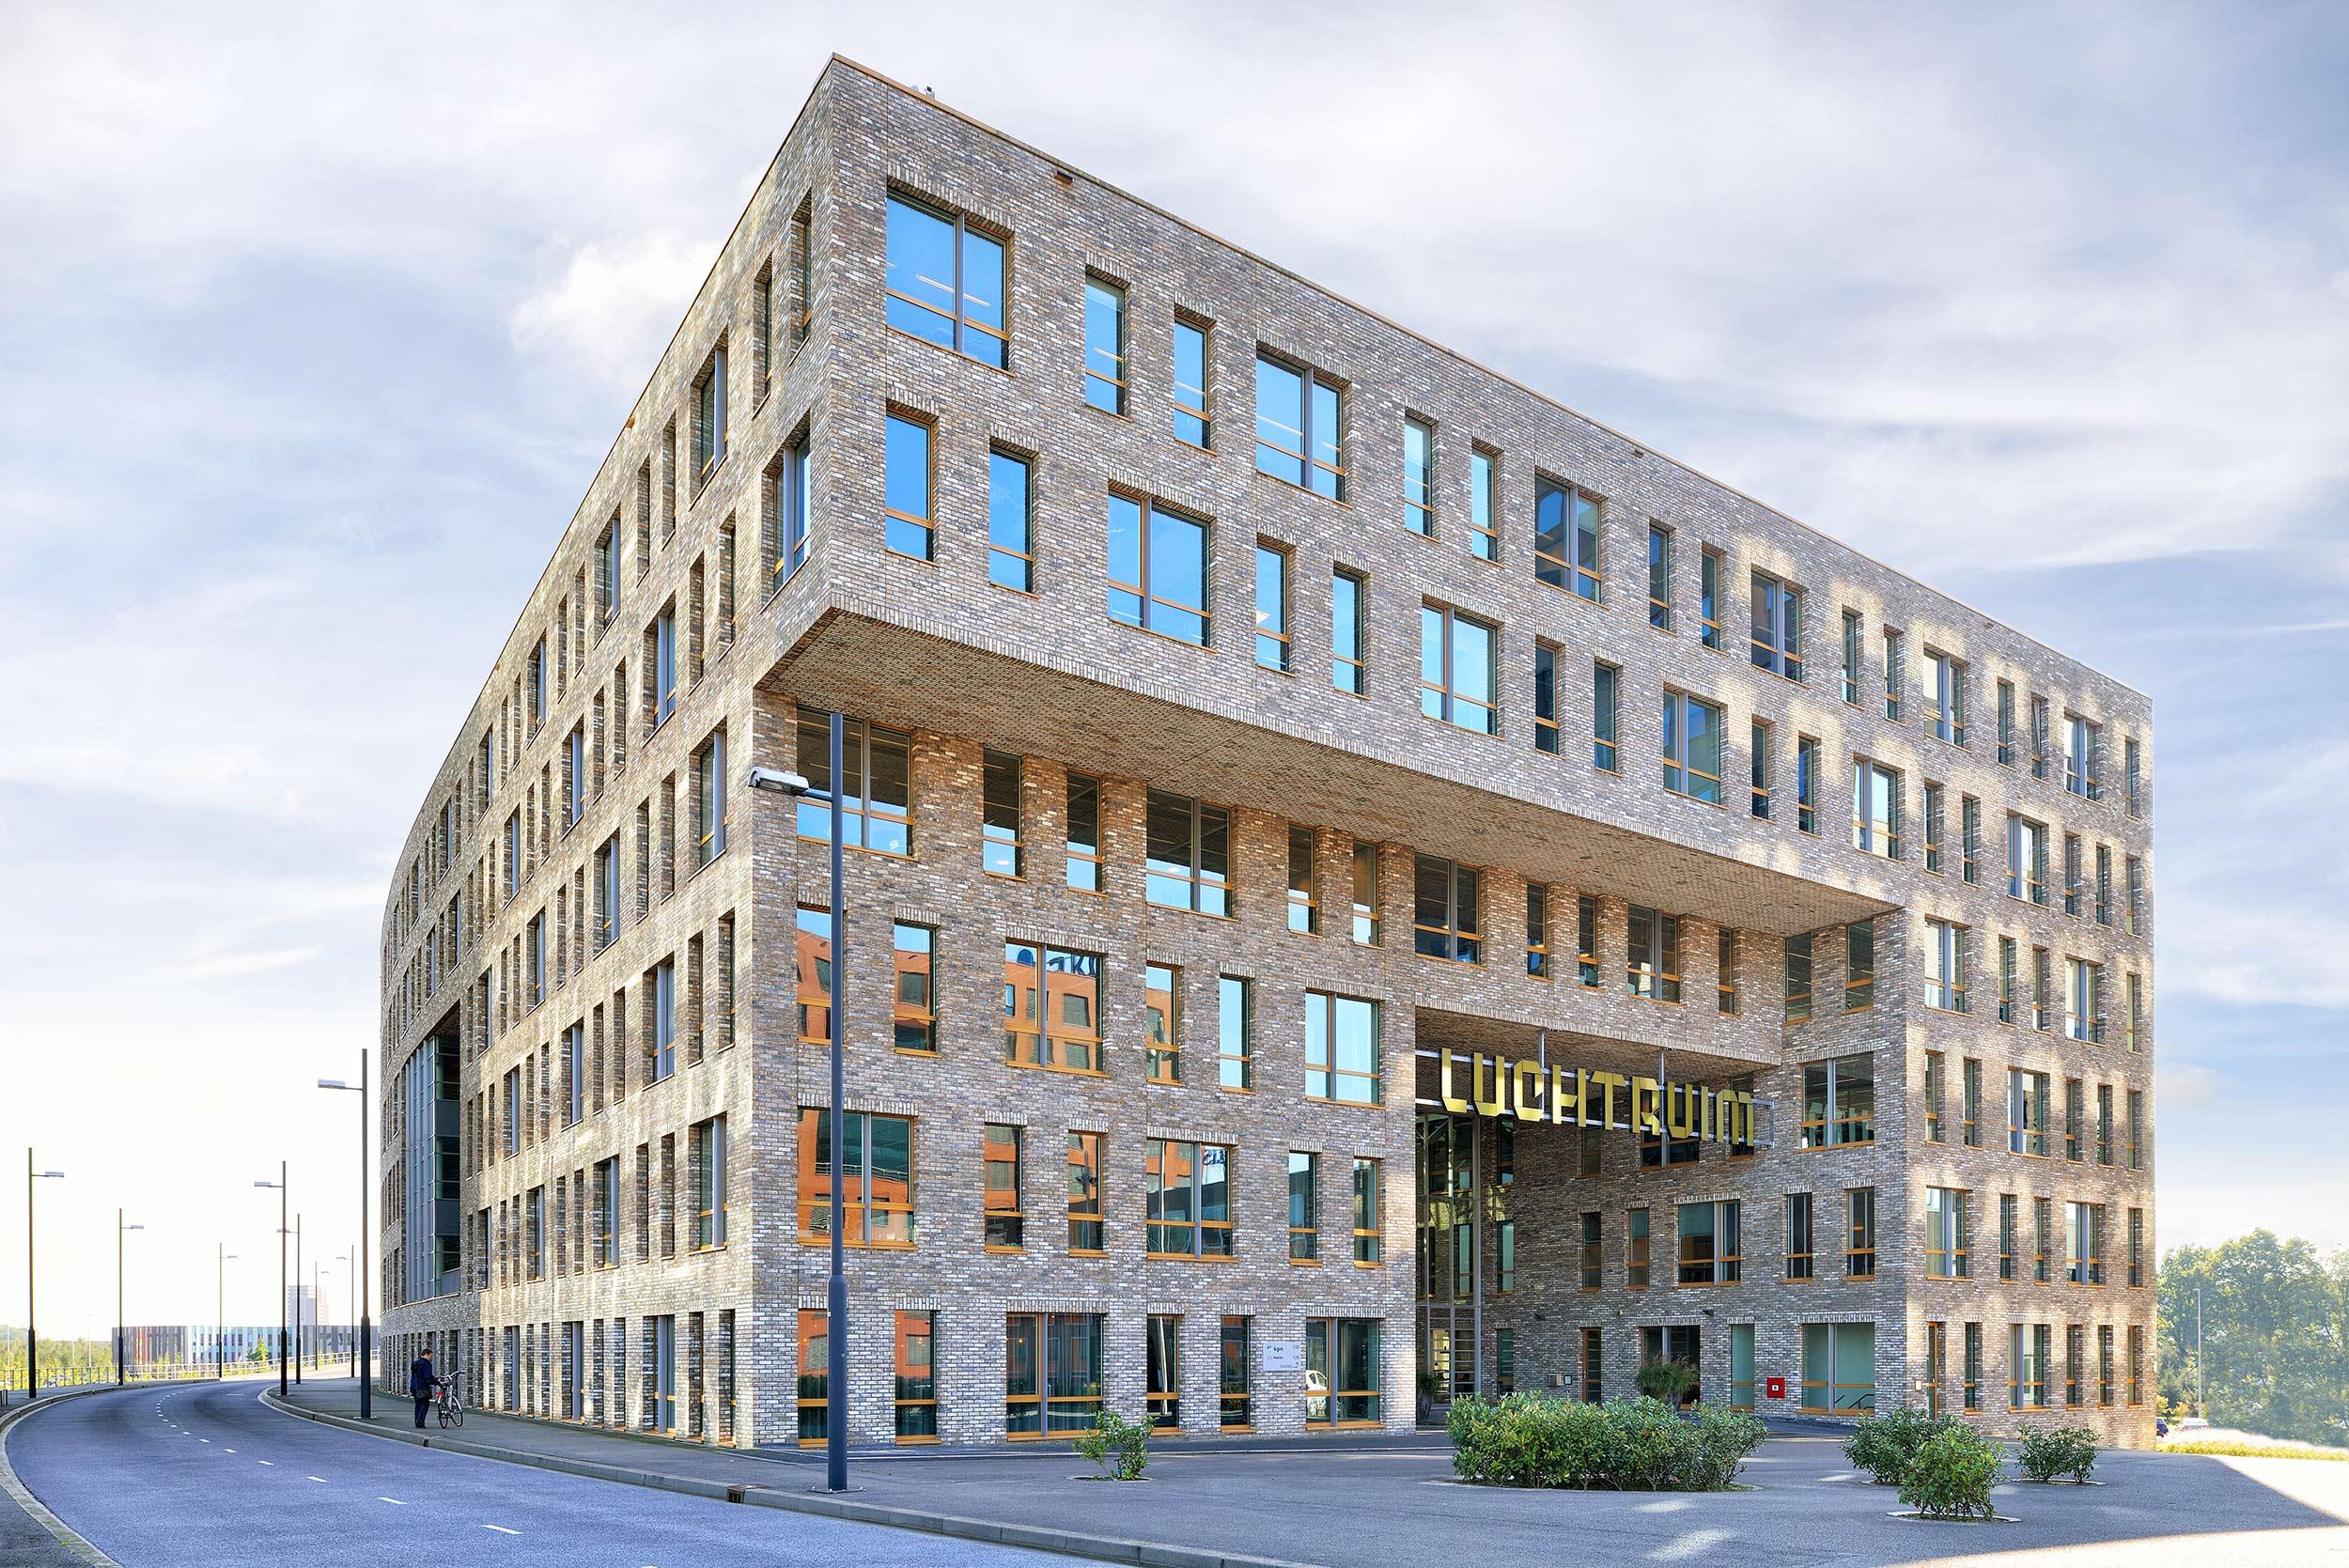 Luchtruim Eindhoven, kantoorgebouw - fotograaf Chiel de Nooyer, architectuurfotograaf